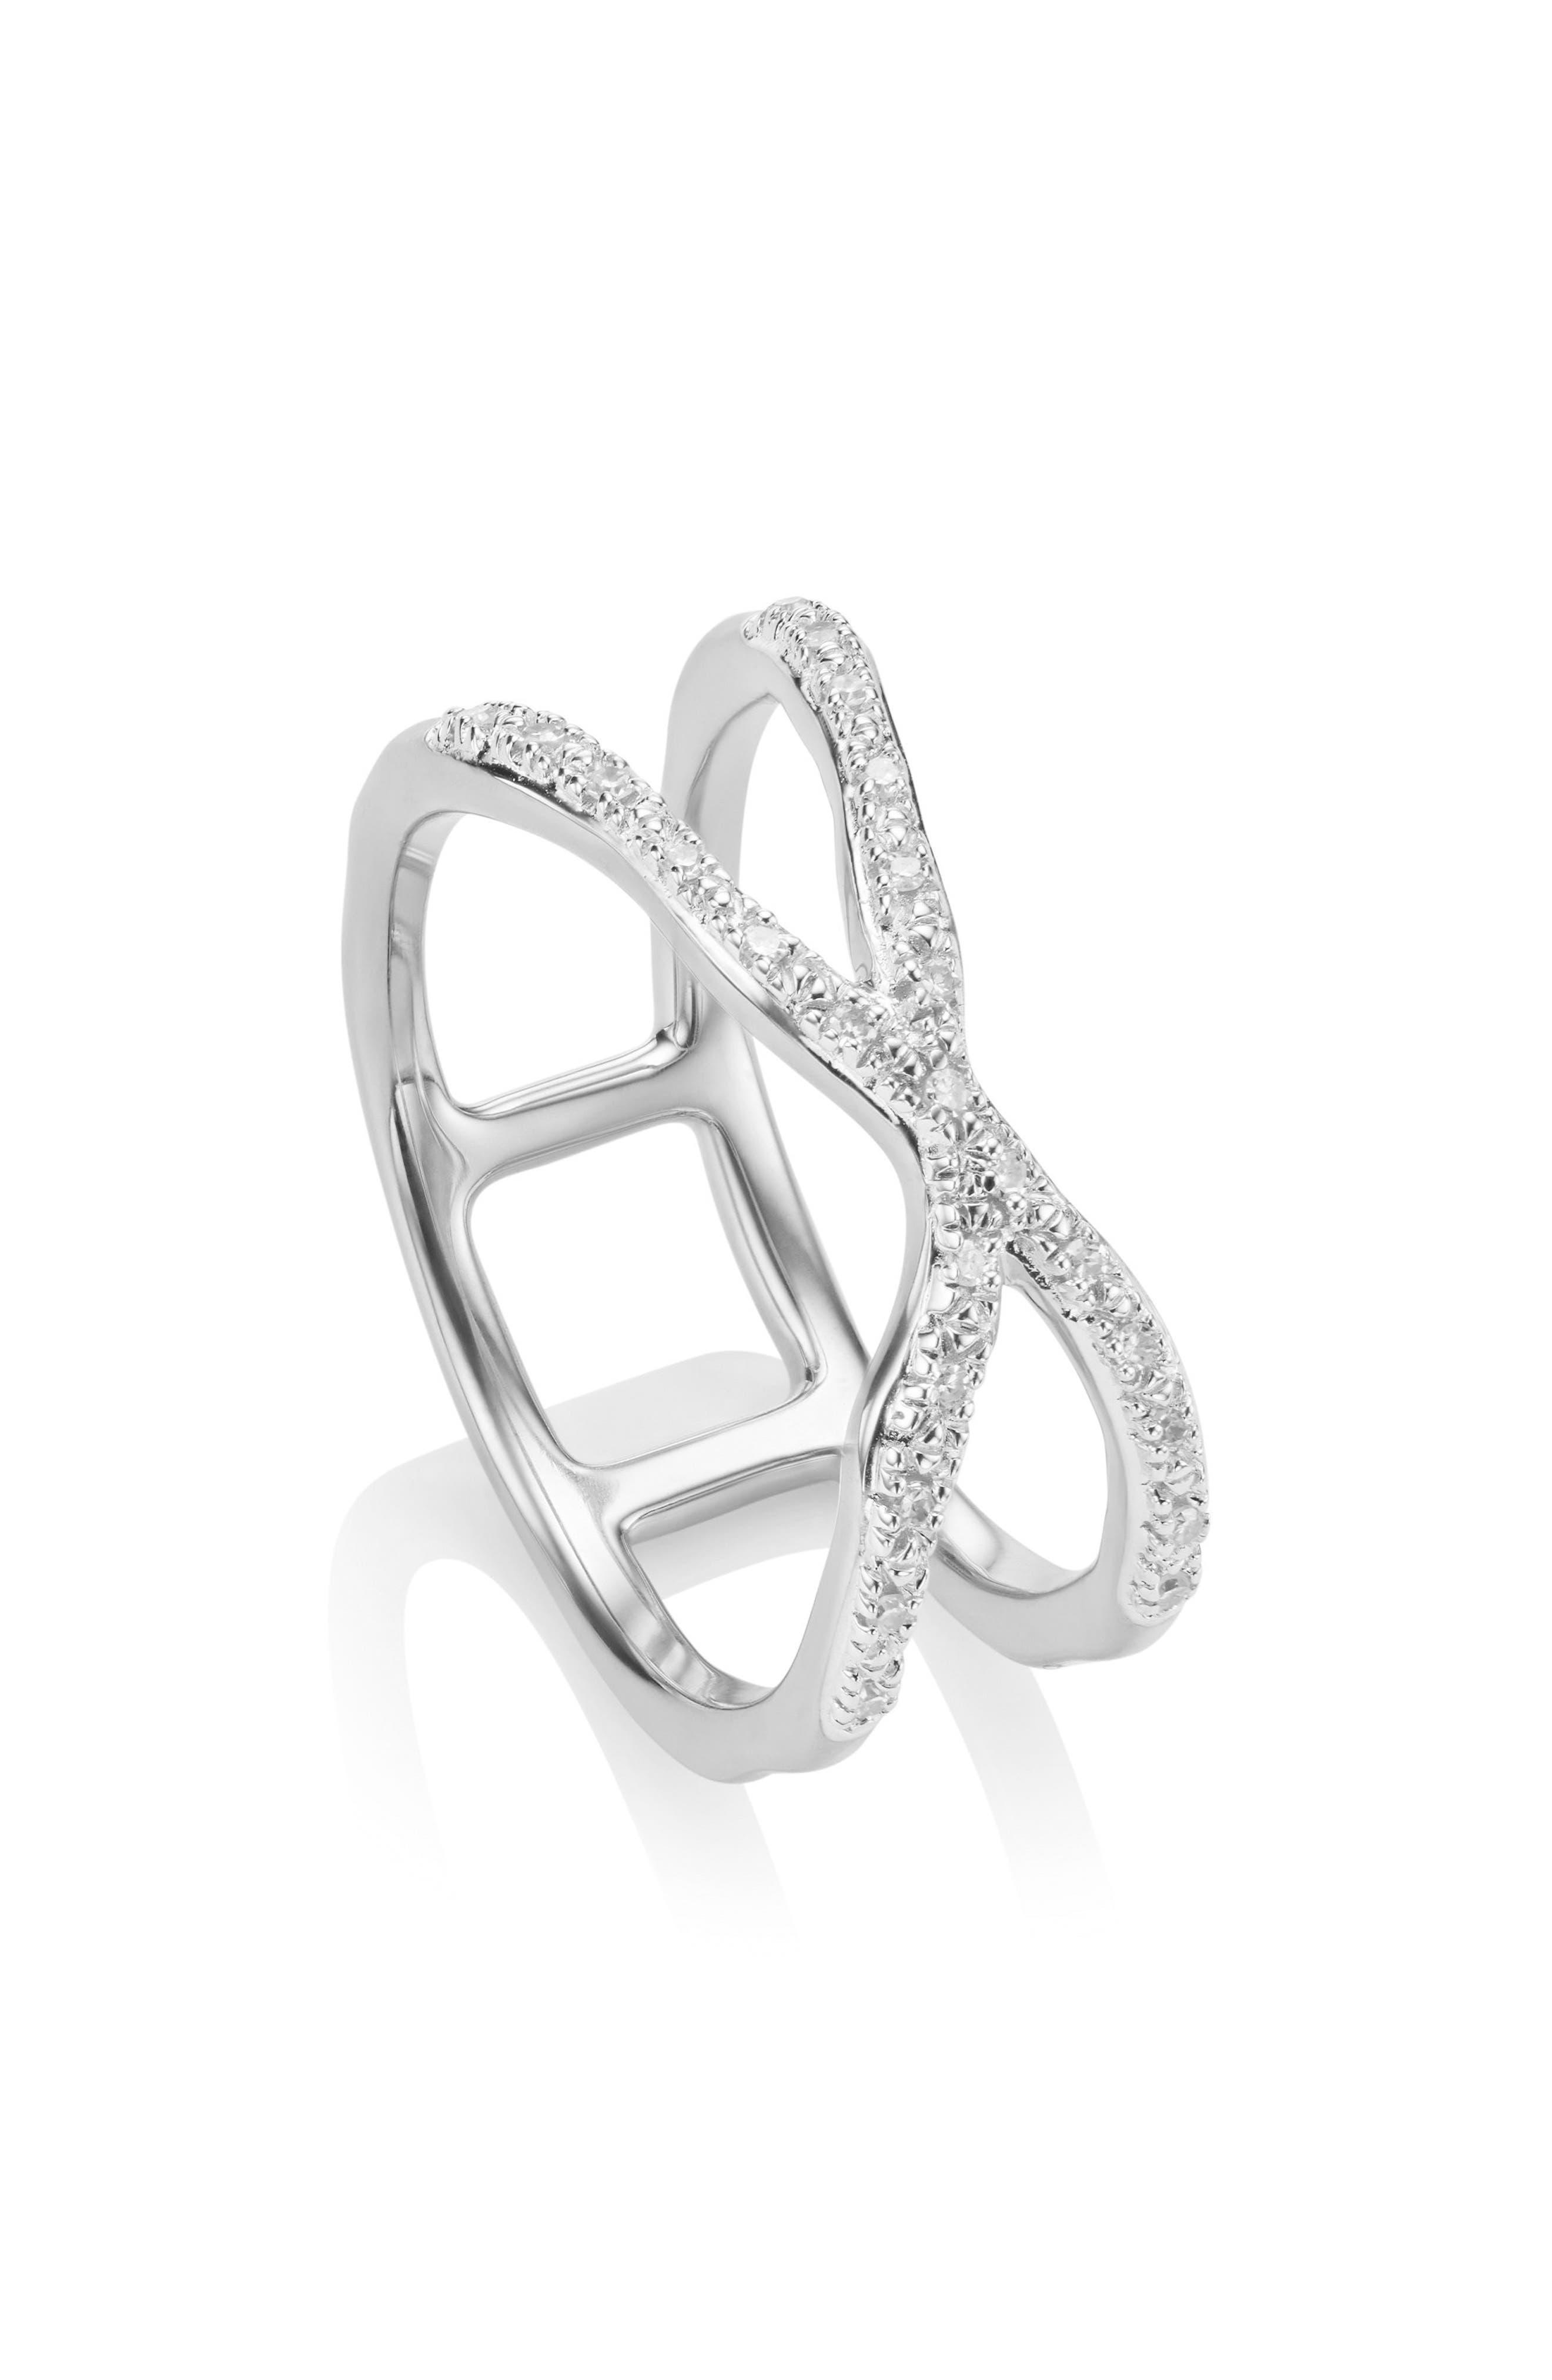 MONICA VINADER, Riva Diamond Ring, Main thumbnail 1, color, SILVER/ DIAMOND